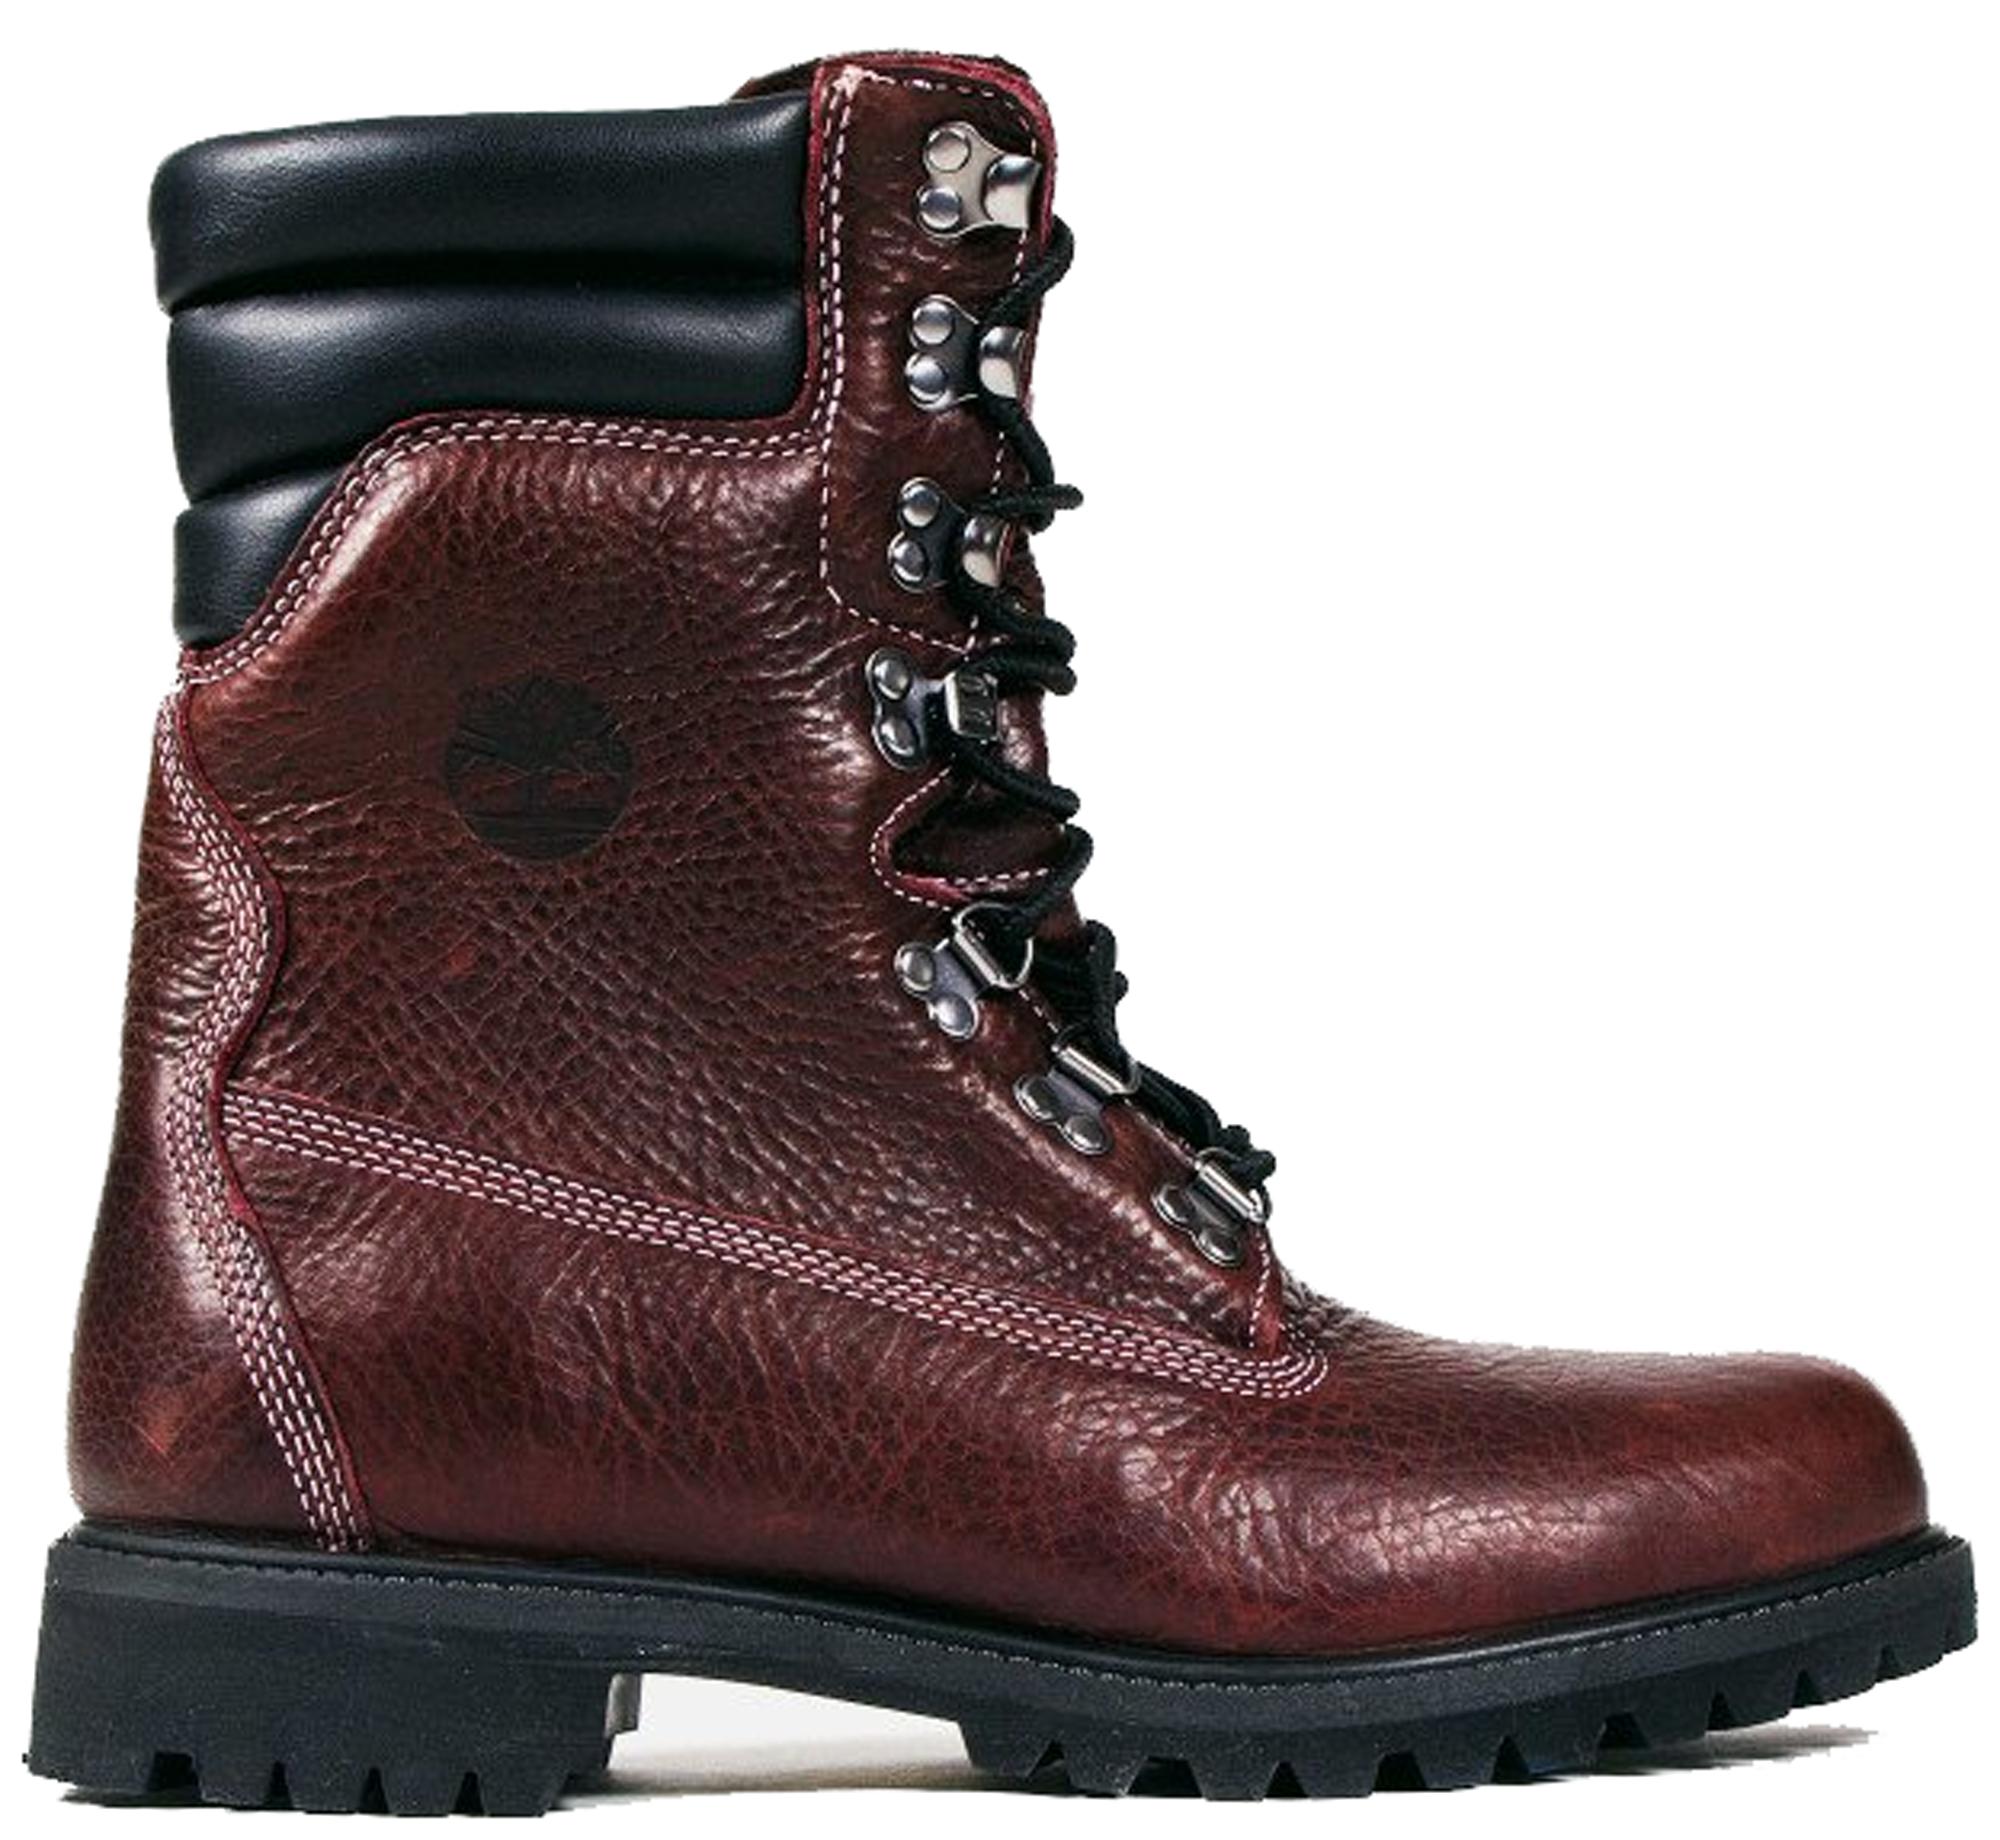 timberland boots kind